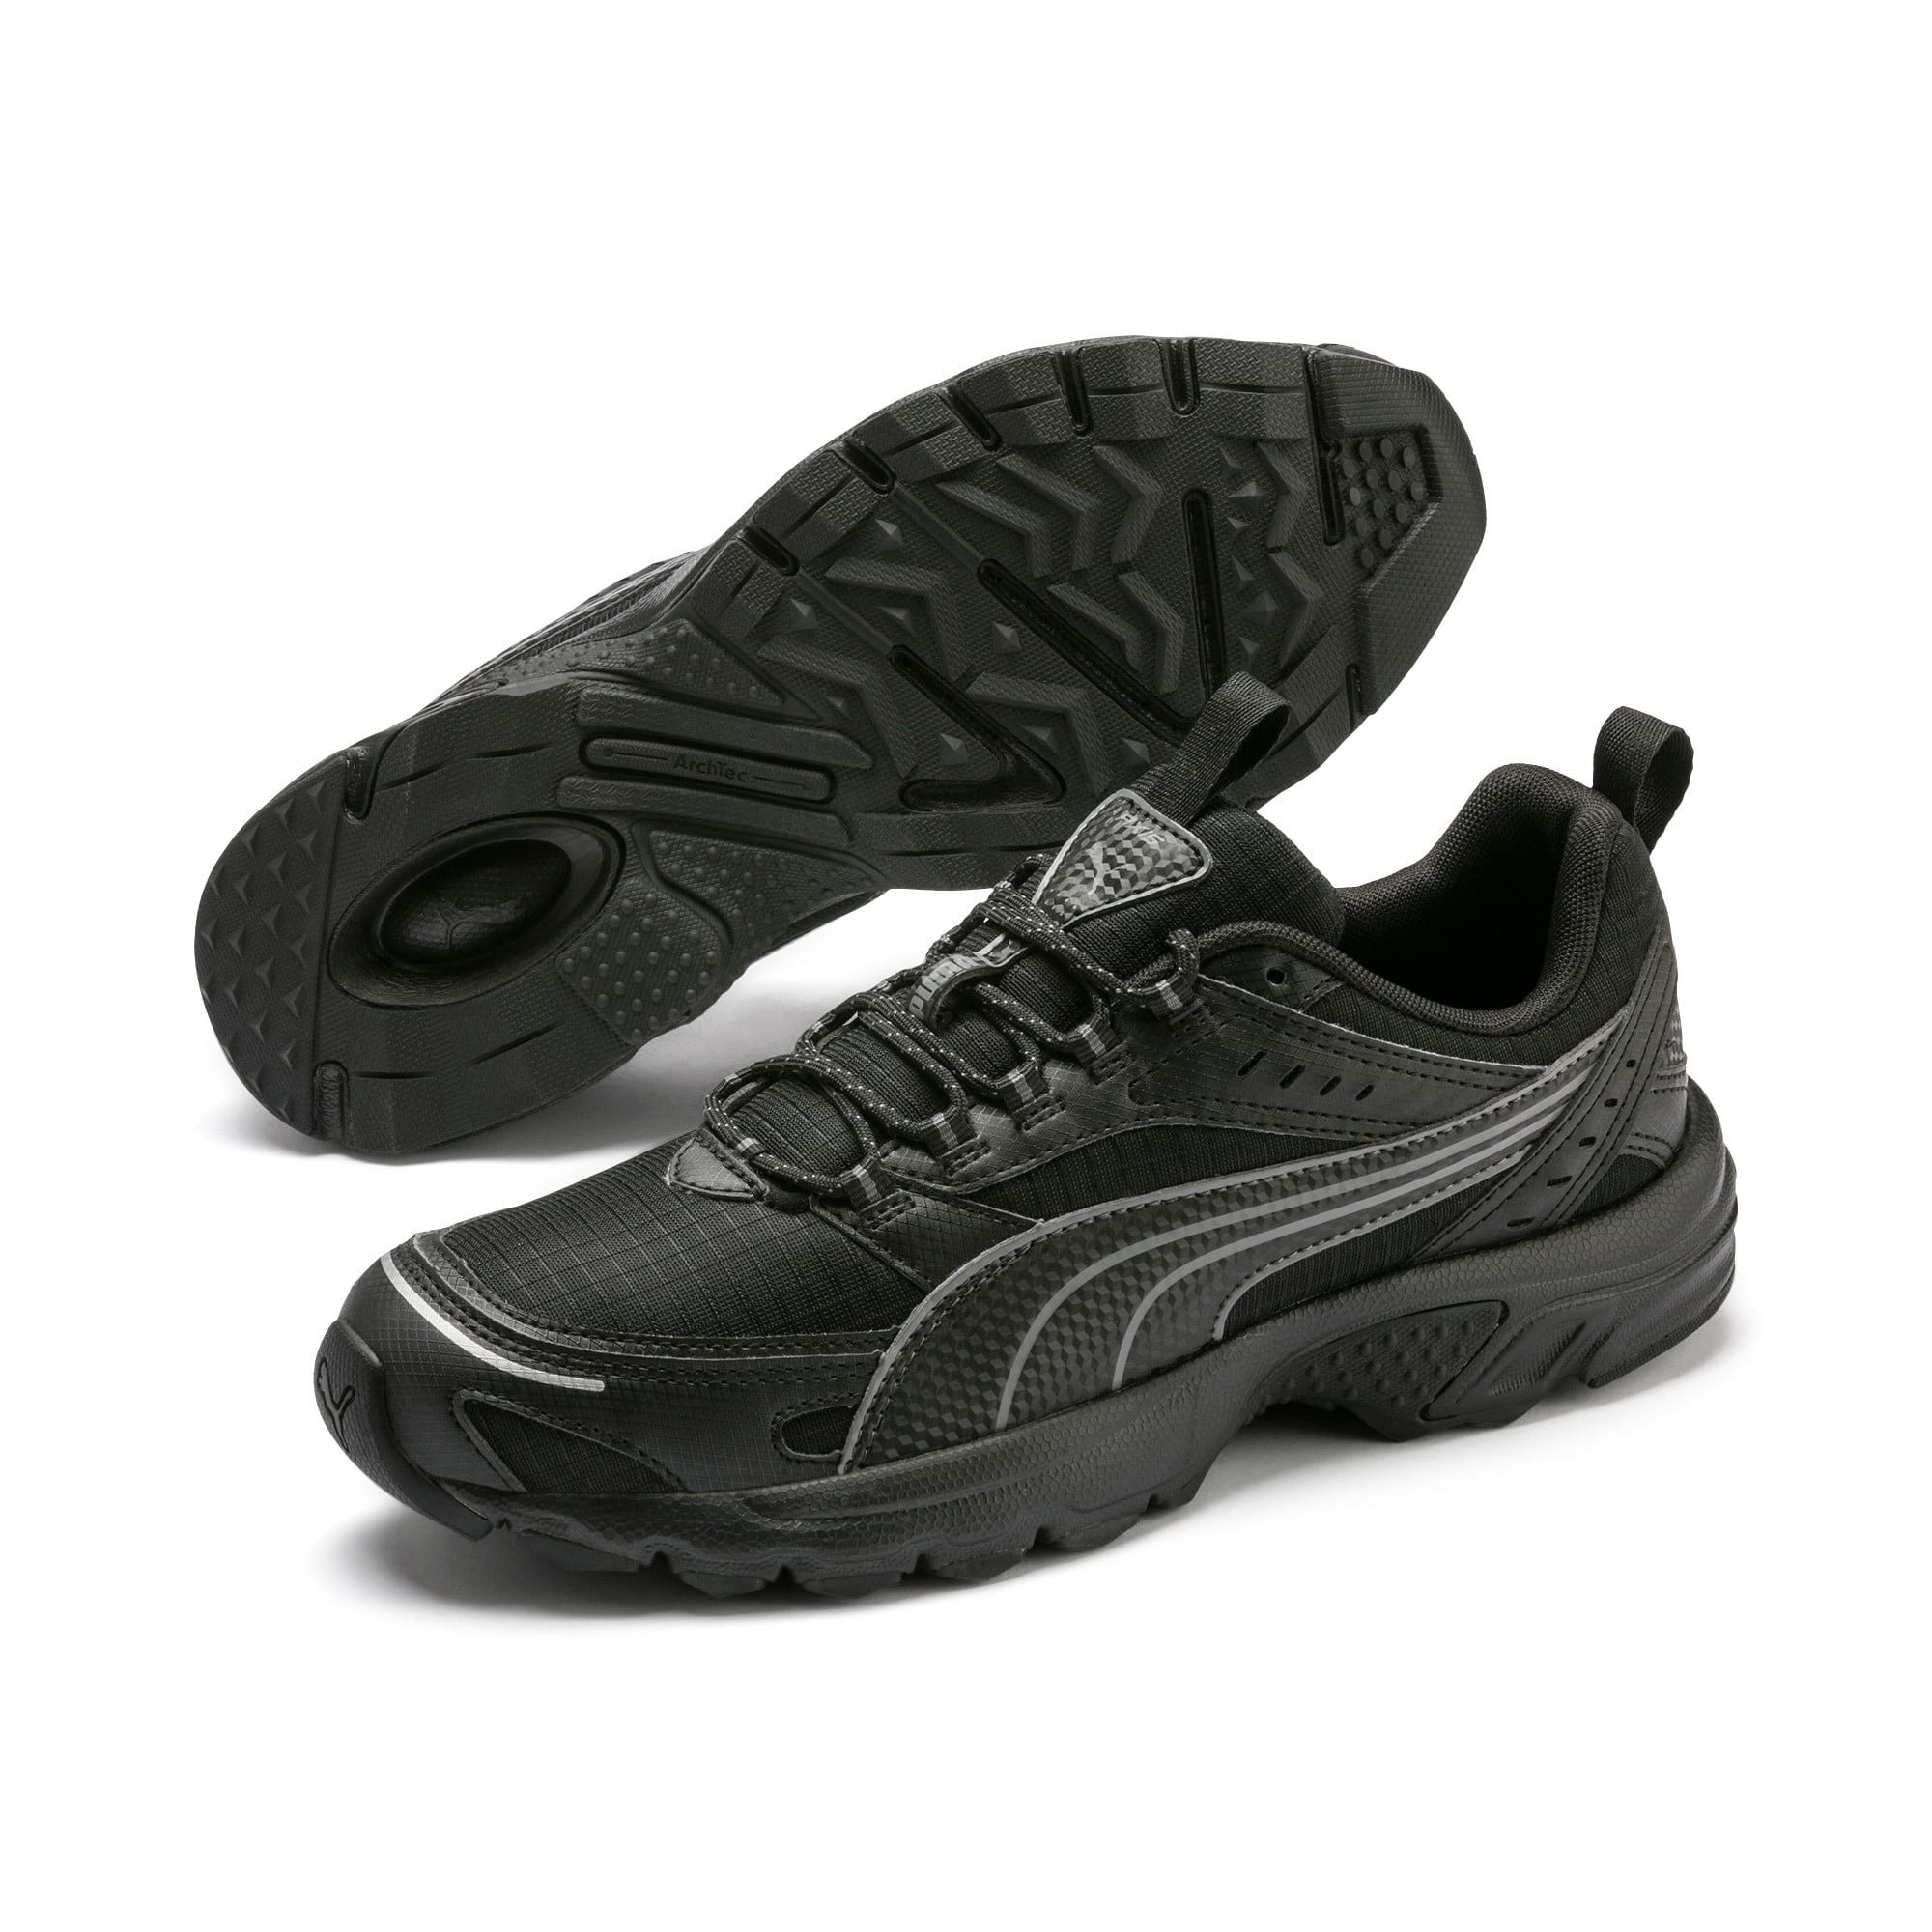 Thumbnail 3 of Axis Trail Sneakers, Puma Black-CASTLEROCK-Silver, medium